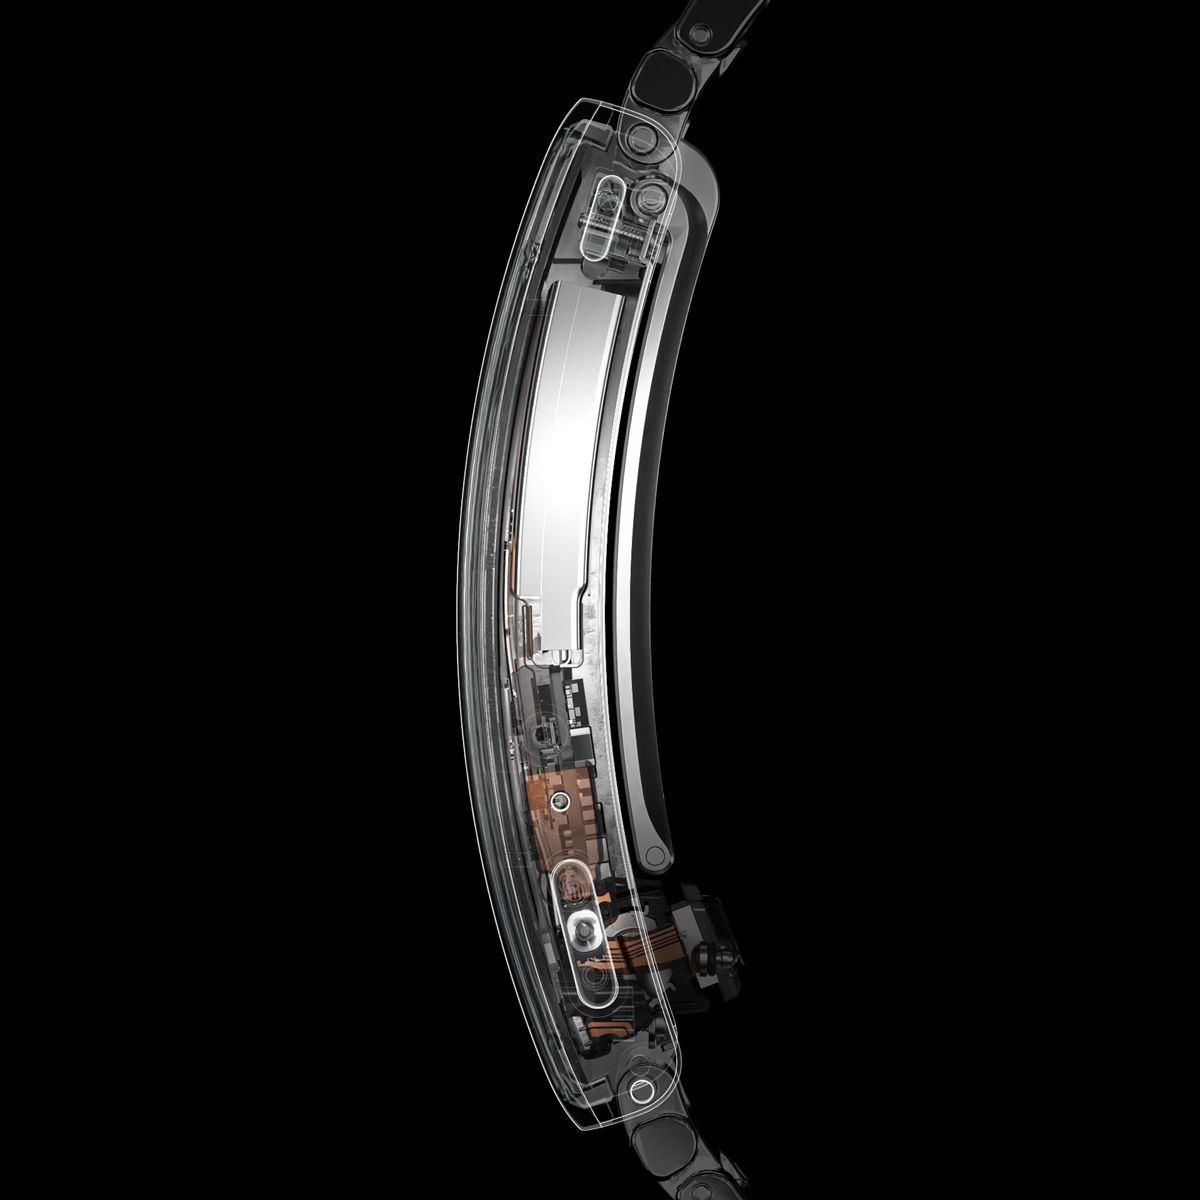 wena 3 metal Black ソニー WNW-B21A/B スマートウォッチ バンド ベルト ウェナ ブラック Suica対応 ラグ幅22mm SONY